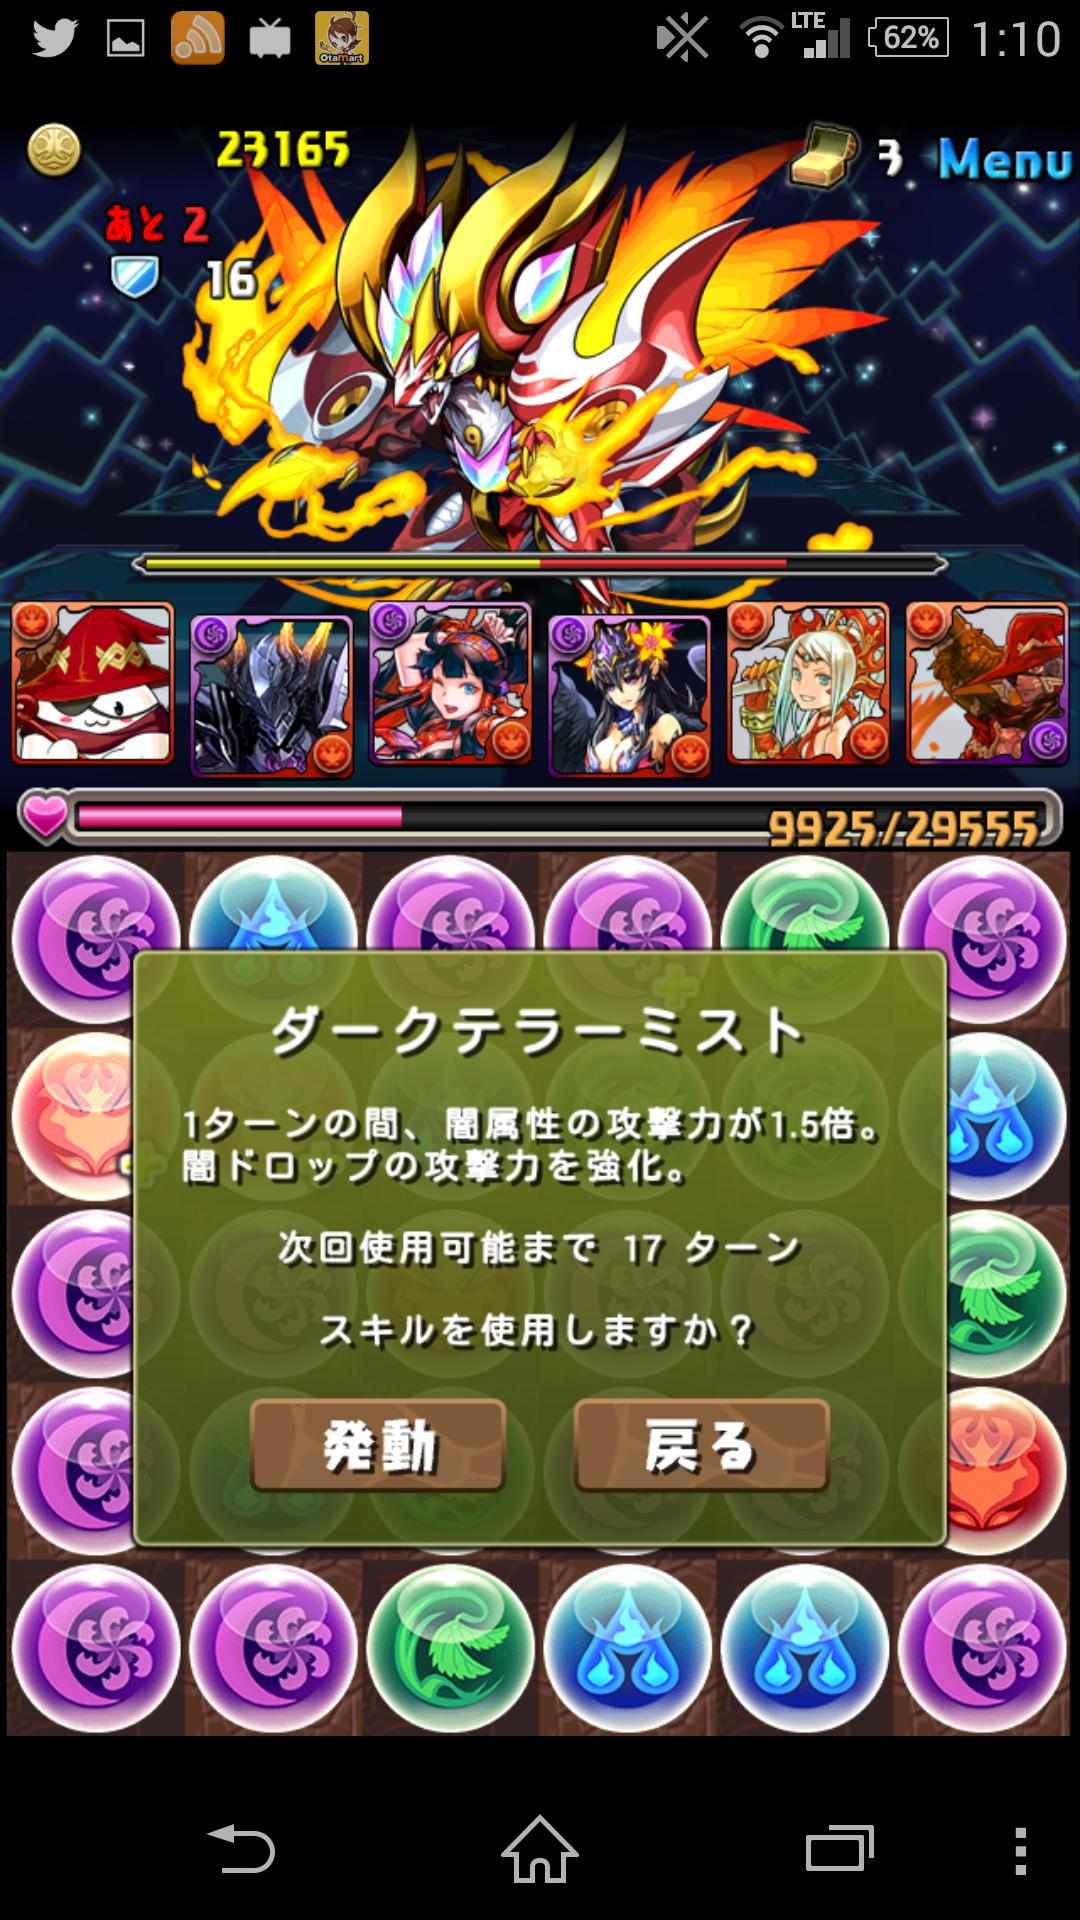 Screenshot_2015-03-18-01-10-15.png